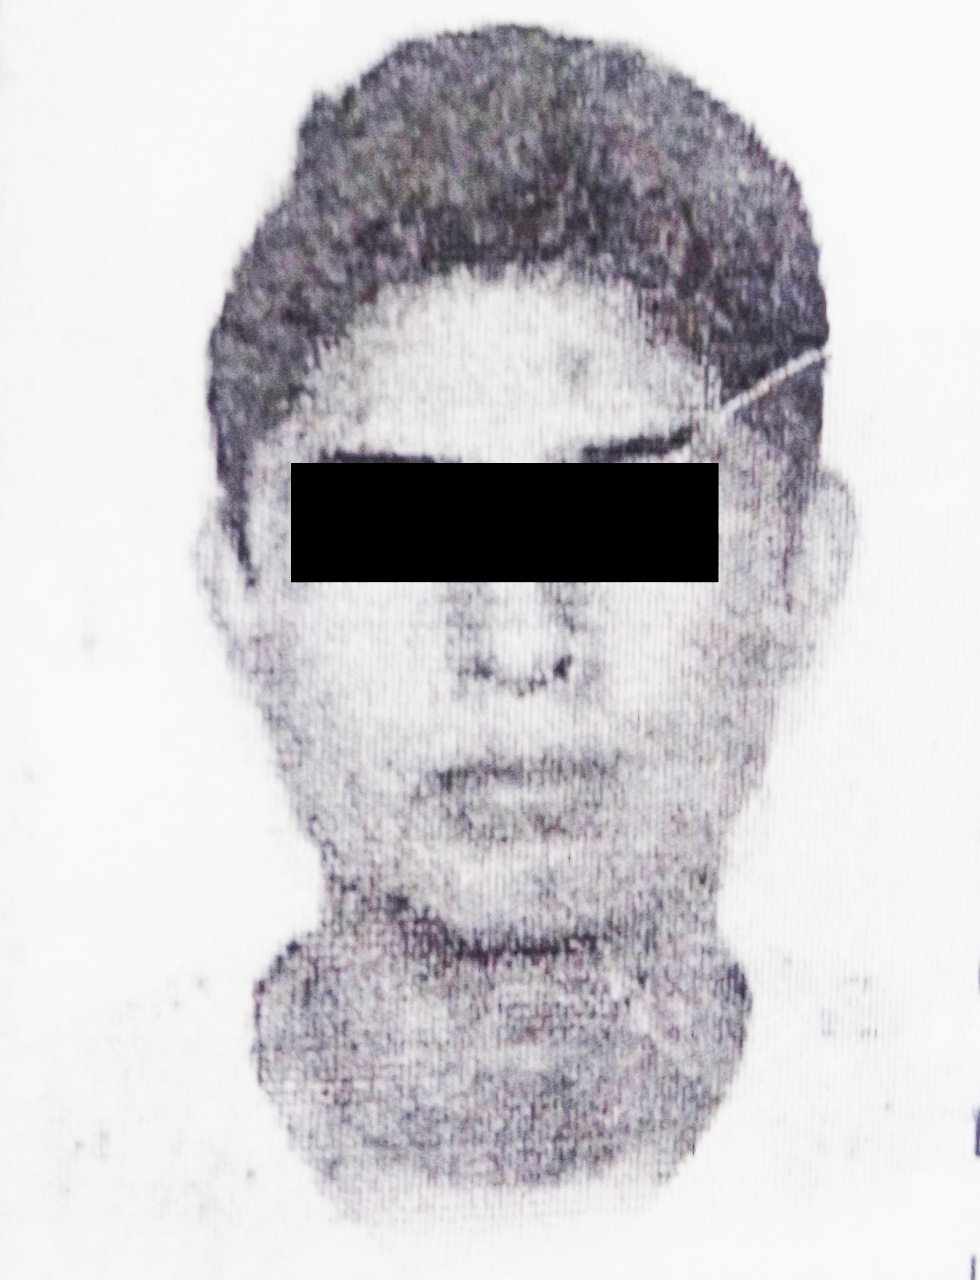 Vincula juez a proceso a persona por abuso sexual en Tuxtla: FGE